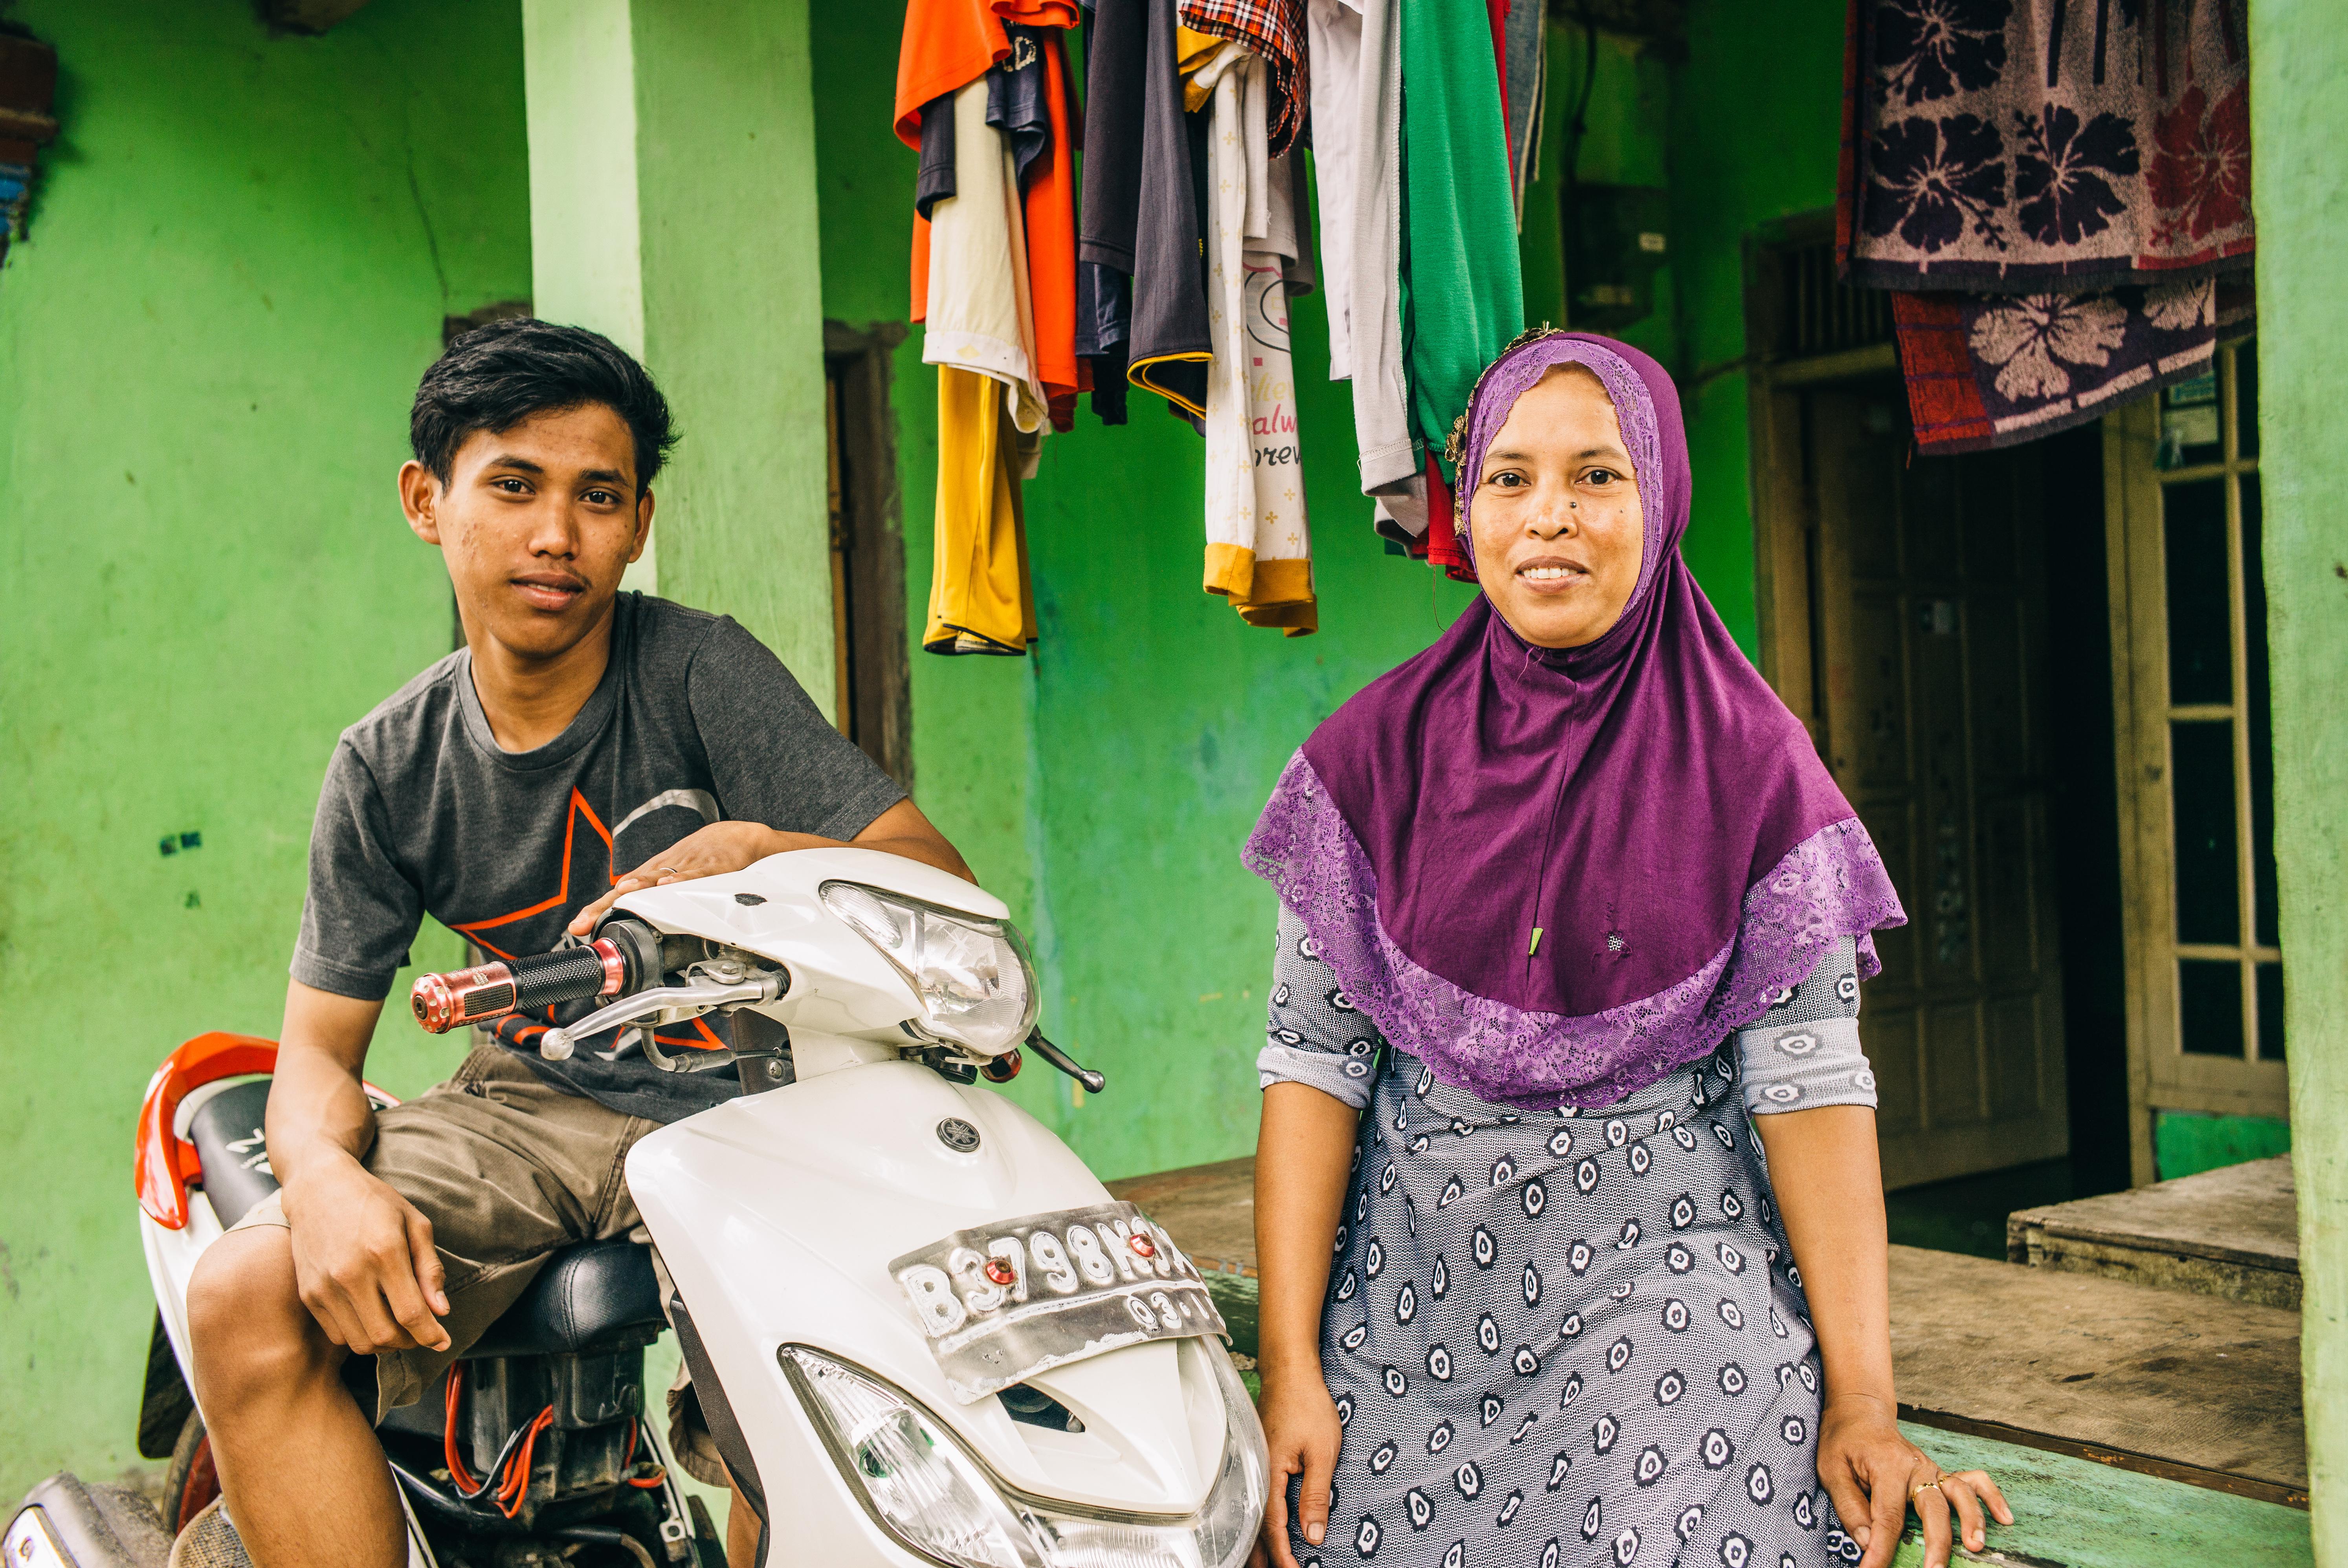 Boy & woman in Indonesia